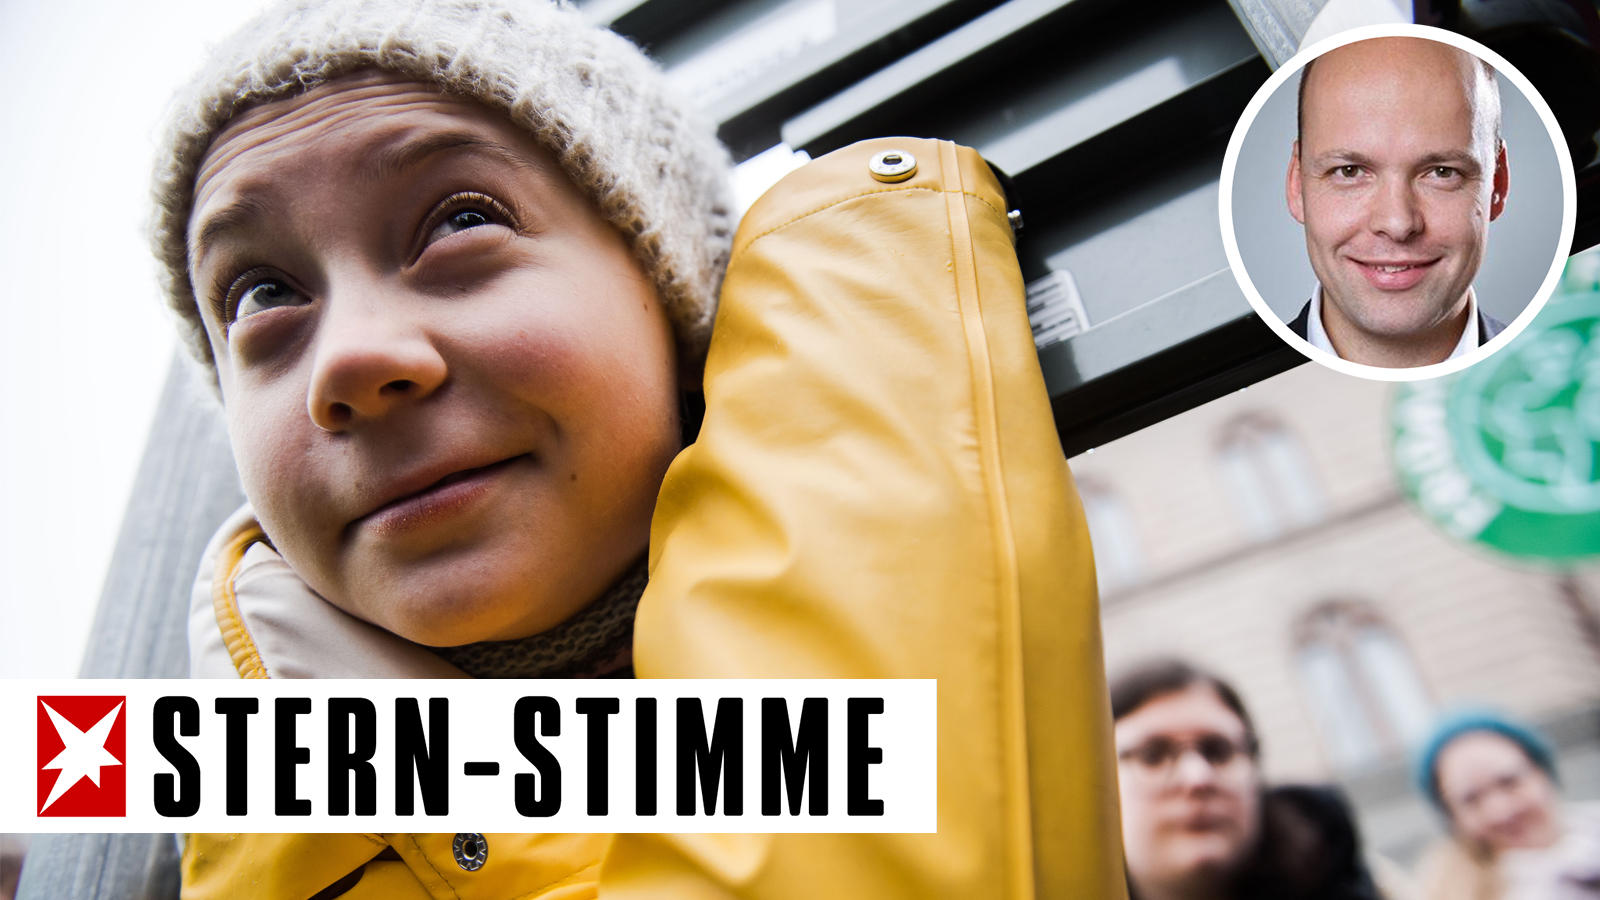 Greta Thunberg Wikipedia: Goldene Kamera Für Klima-Greta, Obwohl Grönland-Eis Dicker